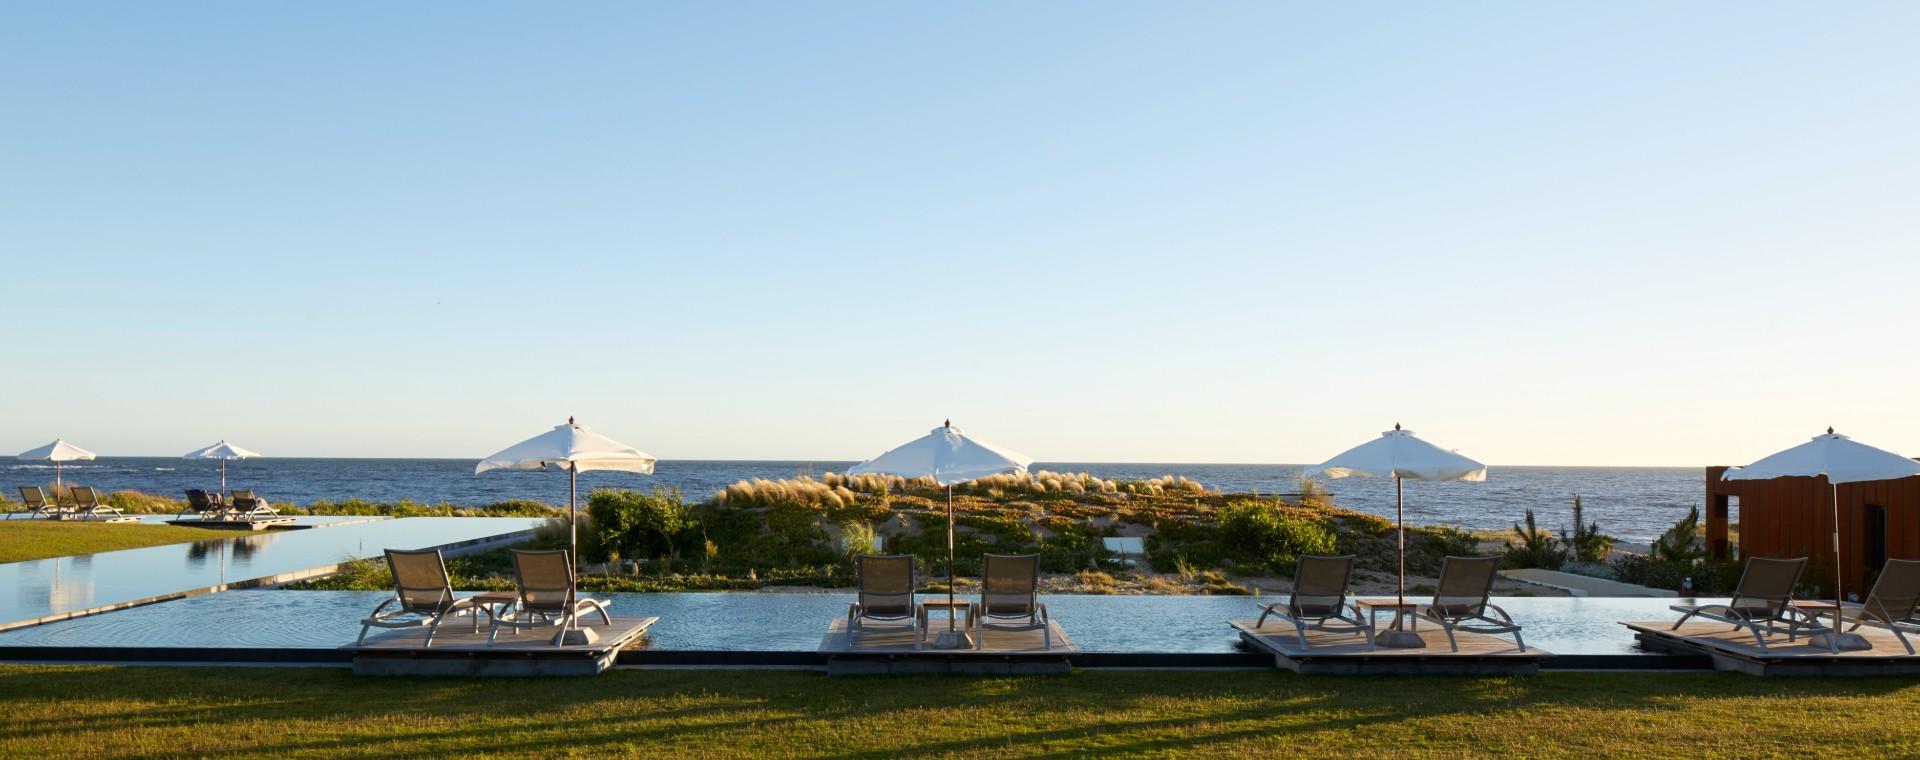 Bahia Vik, Uruguay | Plan South America